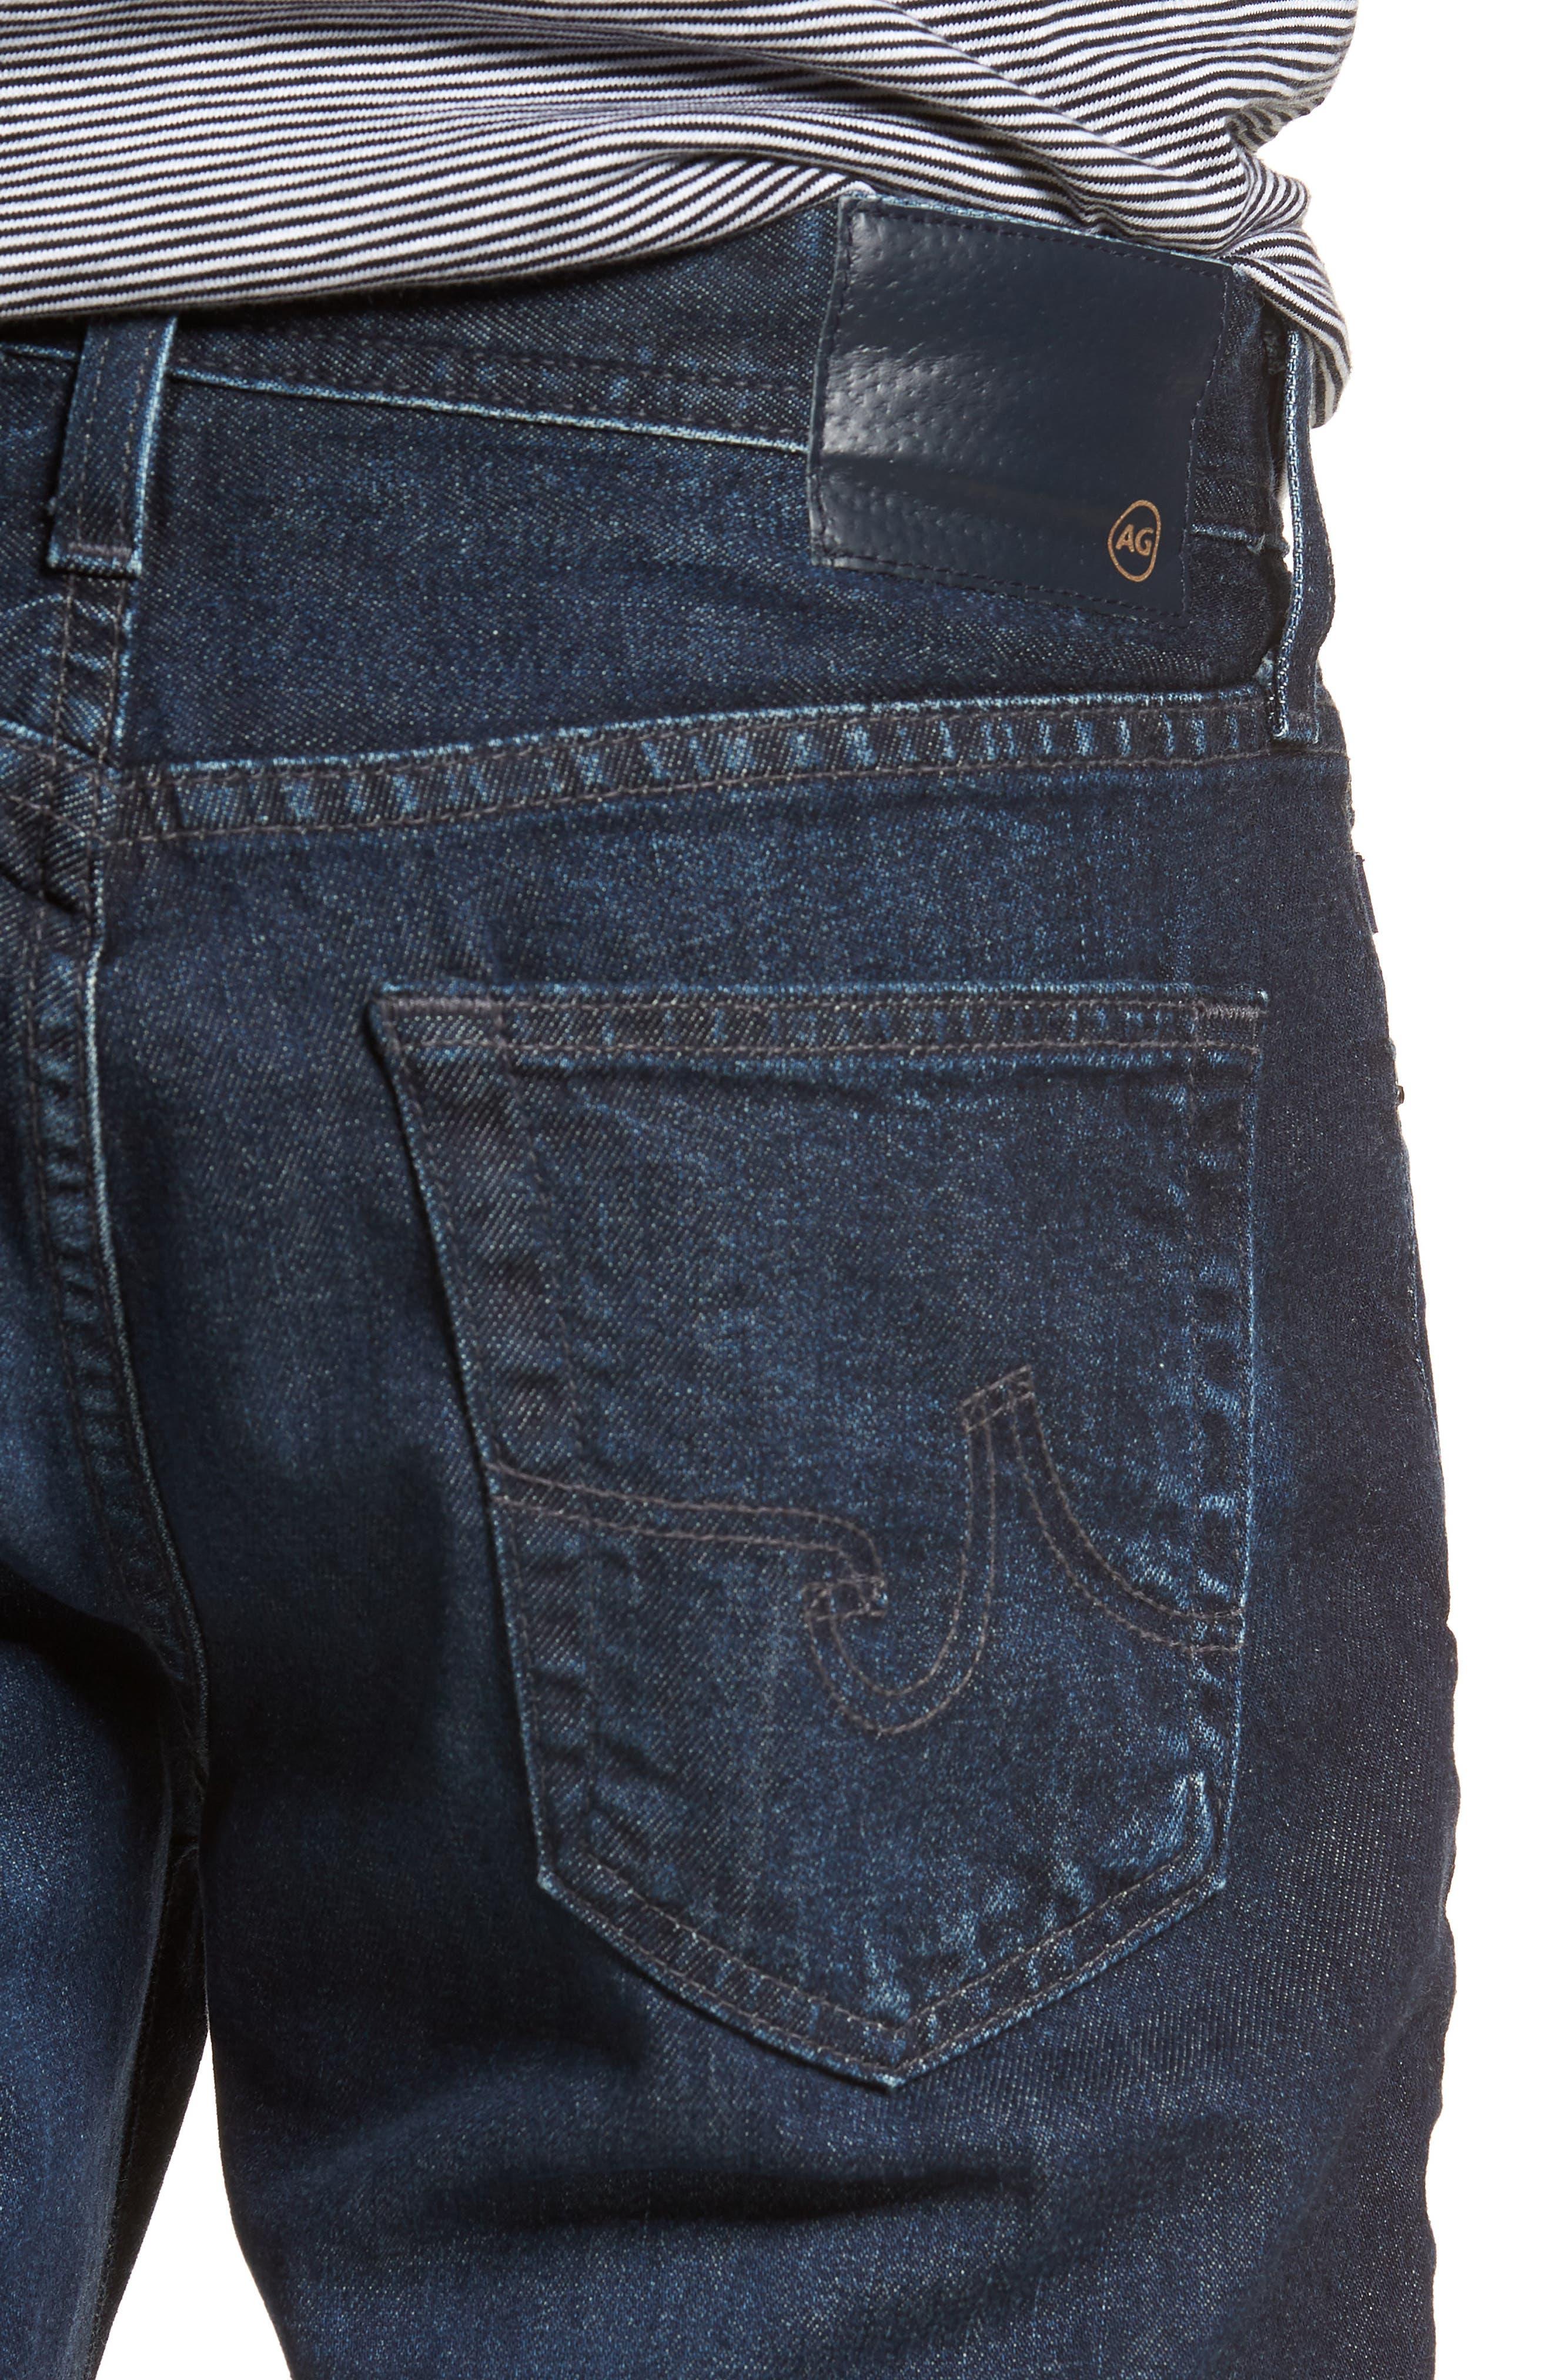 Graduate Slim Straight Leg Jeans,                             Alternate thumbnail 4, color,                             409